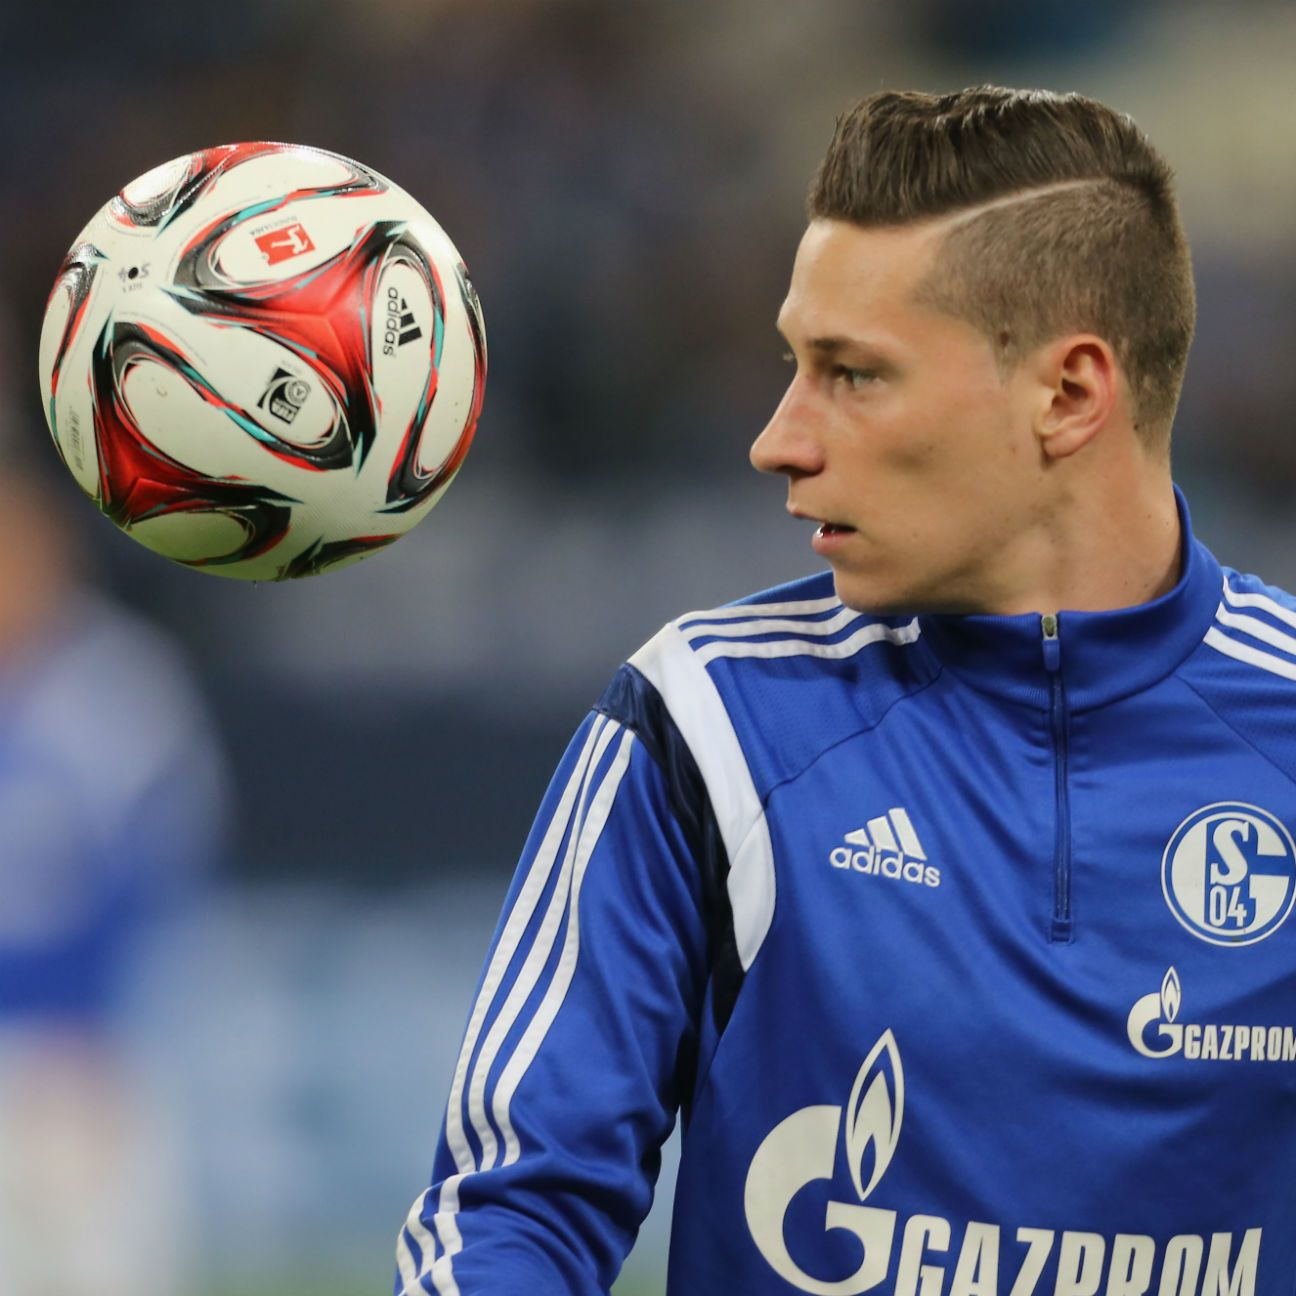 Julian Draxler appeared in 15 Bundesliga matches in 2014-15 for Schalke.